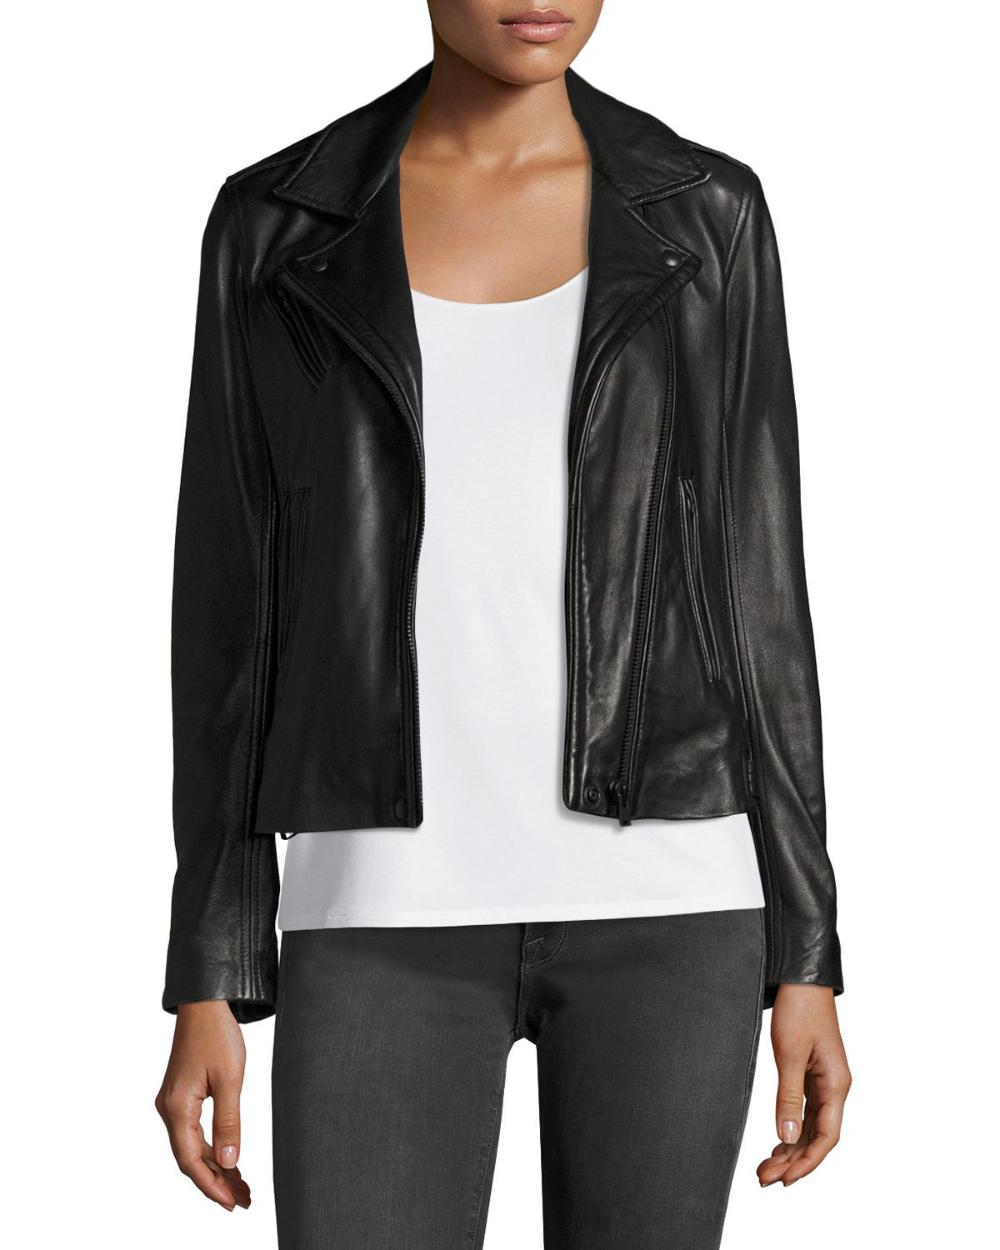 Iro Han Leather Zip Front Moto Jacket Moto Jacket Jackets Lambskin Leather Jacket [ 1250 x 1000 Pixel ]